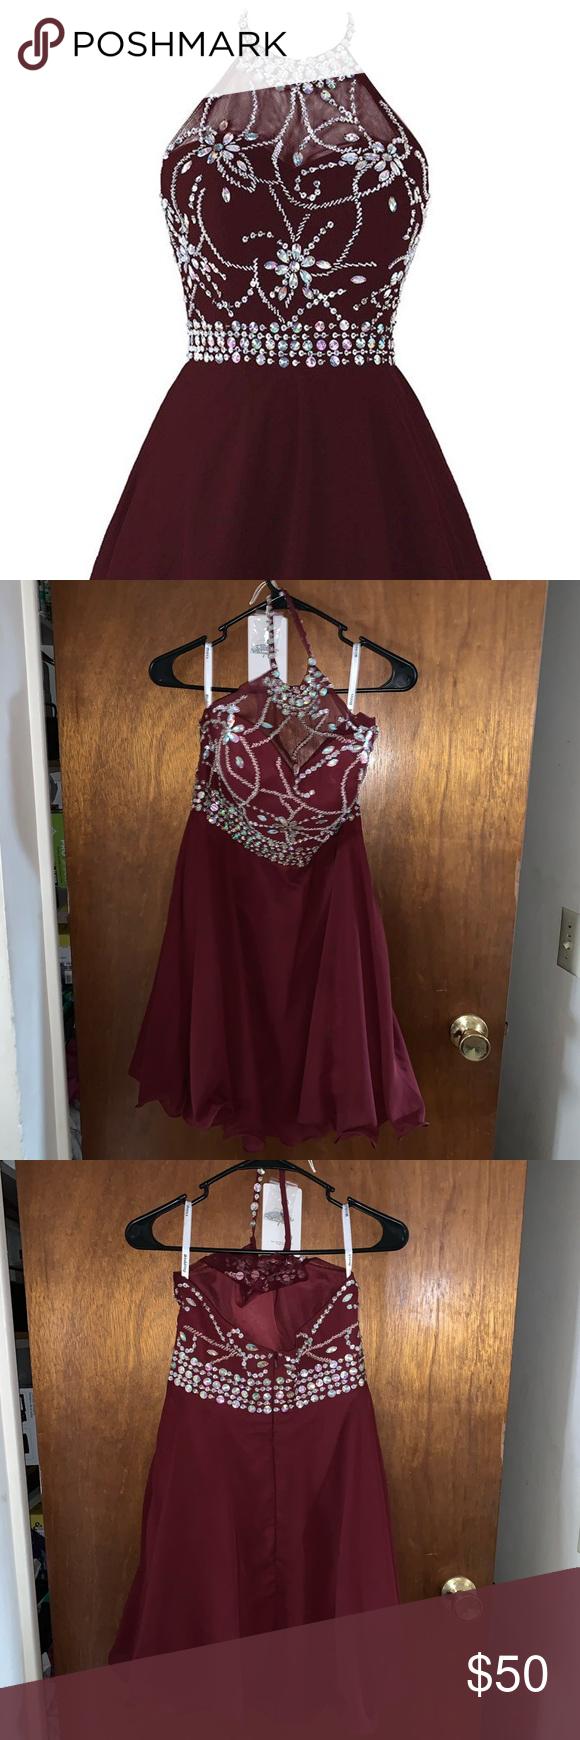 Prom Semi Formal Dress Wine Colored Dresses Dresses Formal Dresses [ 1740 x 580 Pixel ]